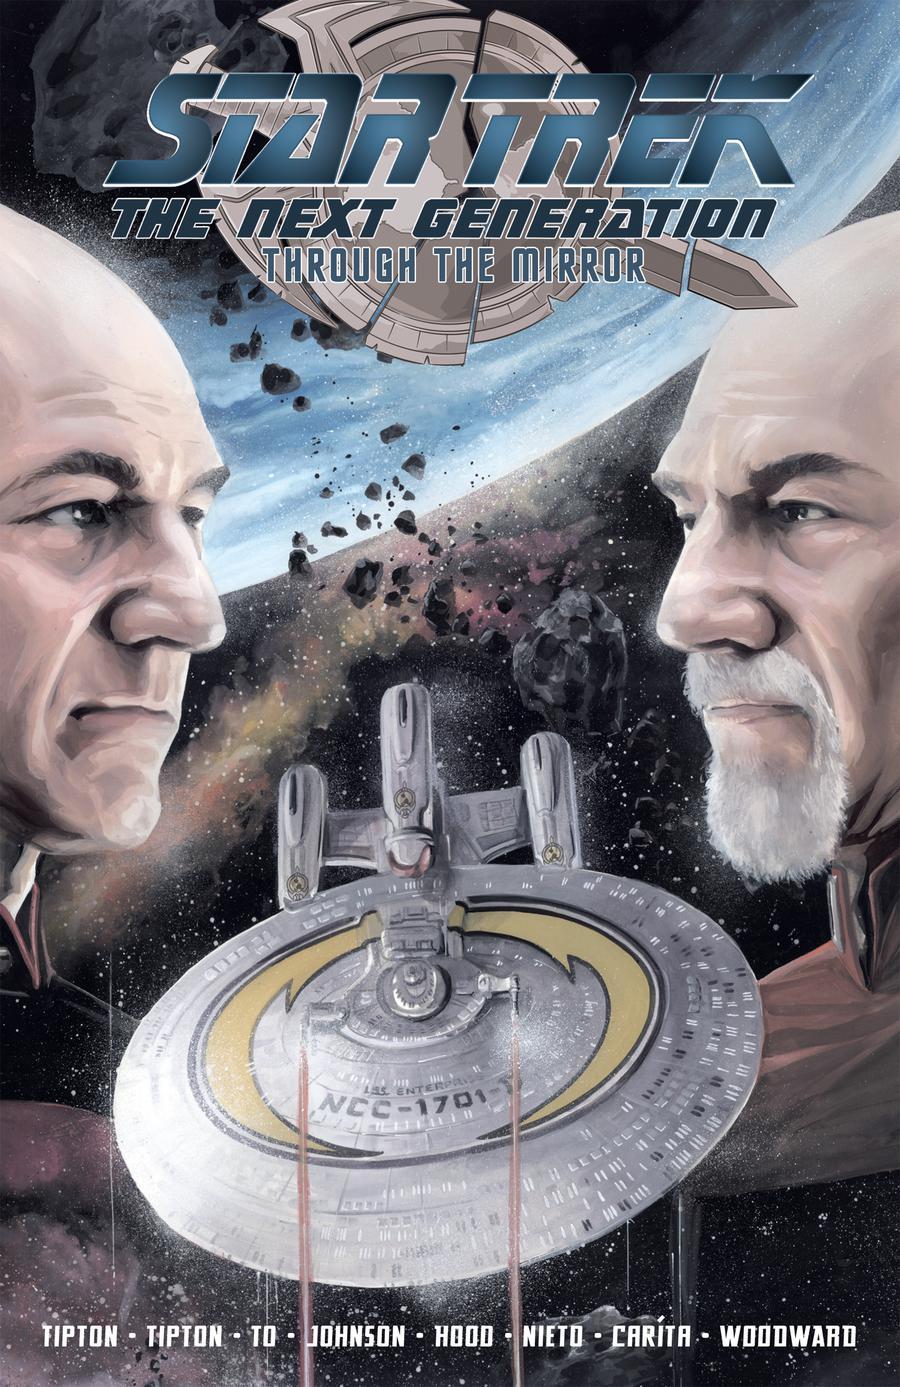 Star Trek The Next Generation Through The Mirror TP